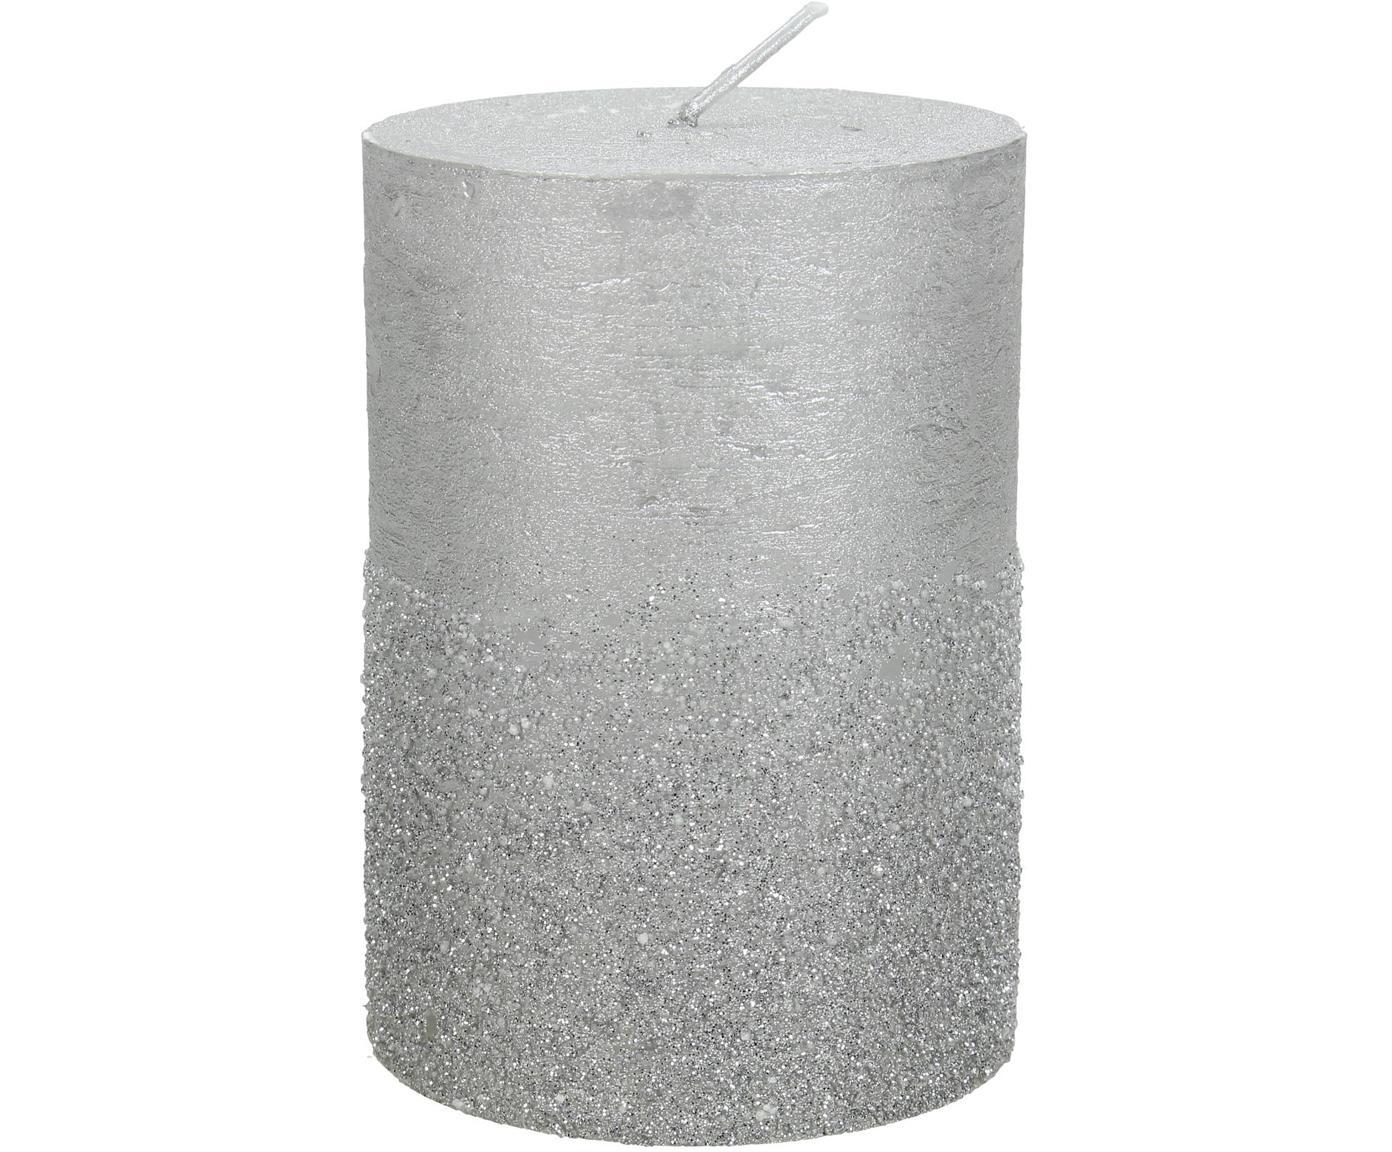 Stumpenkerze Glitters, Wachs, Silberfarben, Ø 7 x H 10 cm